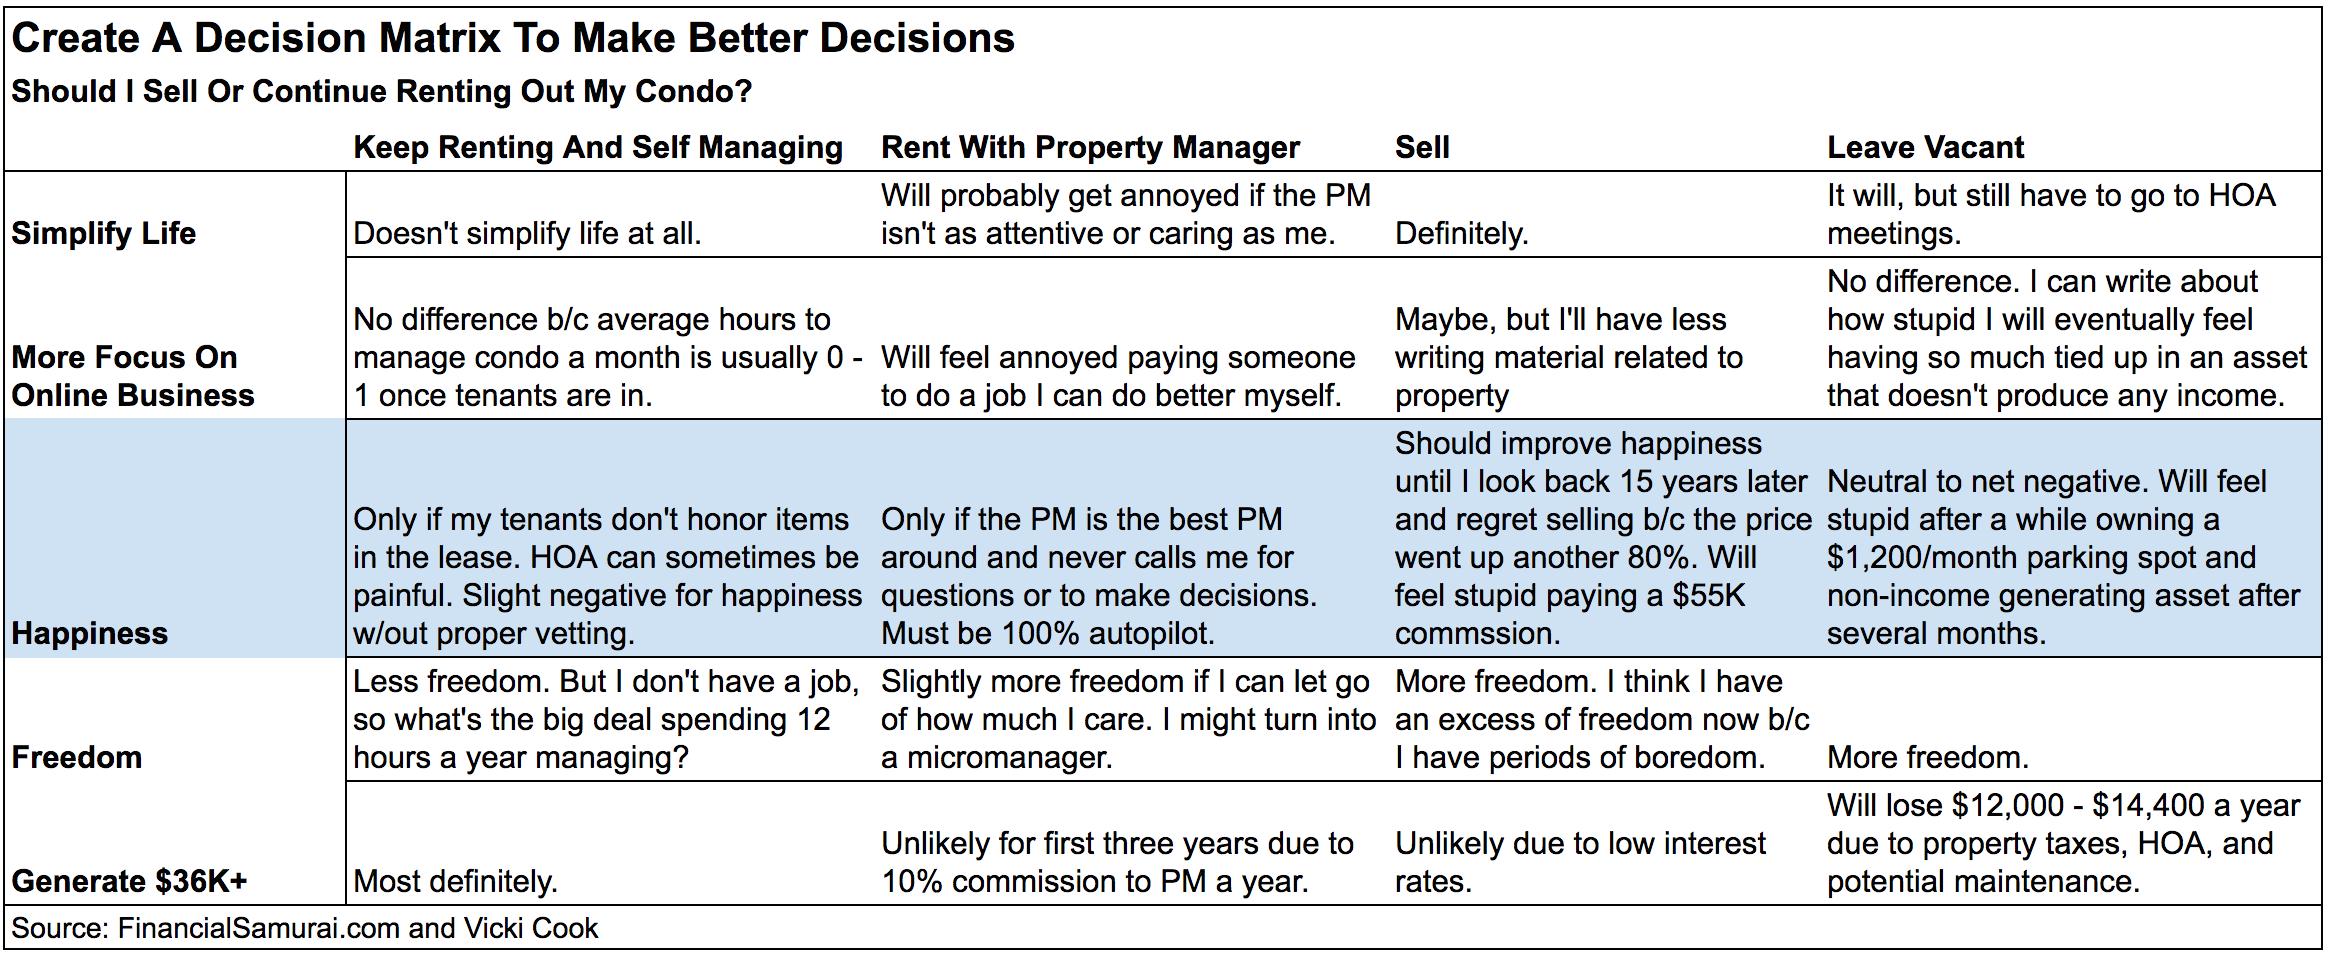 Financial Samurai Decision Matrix